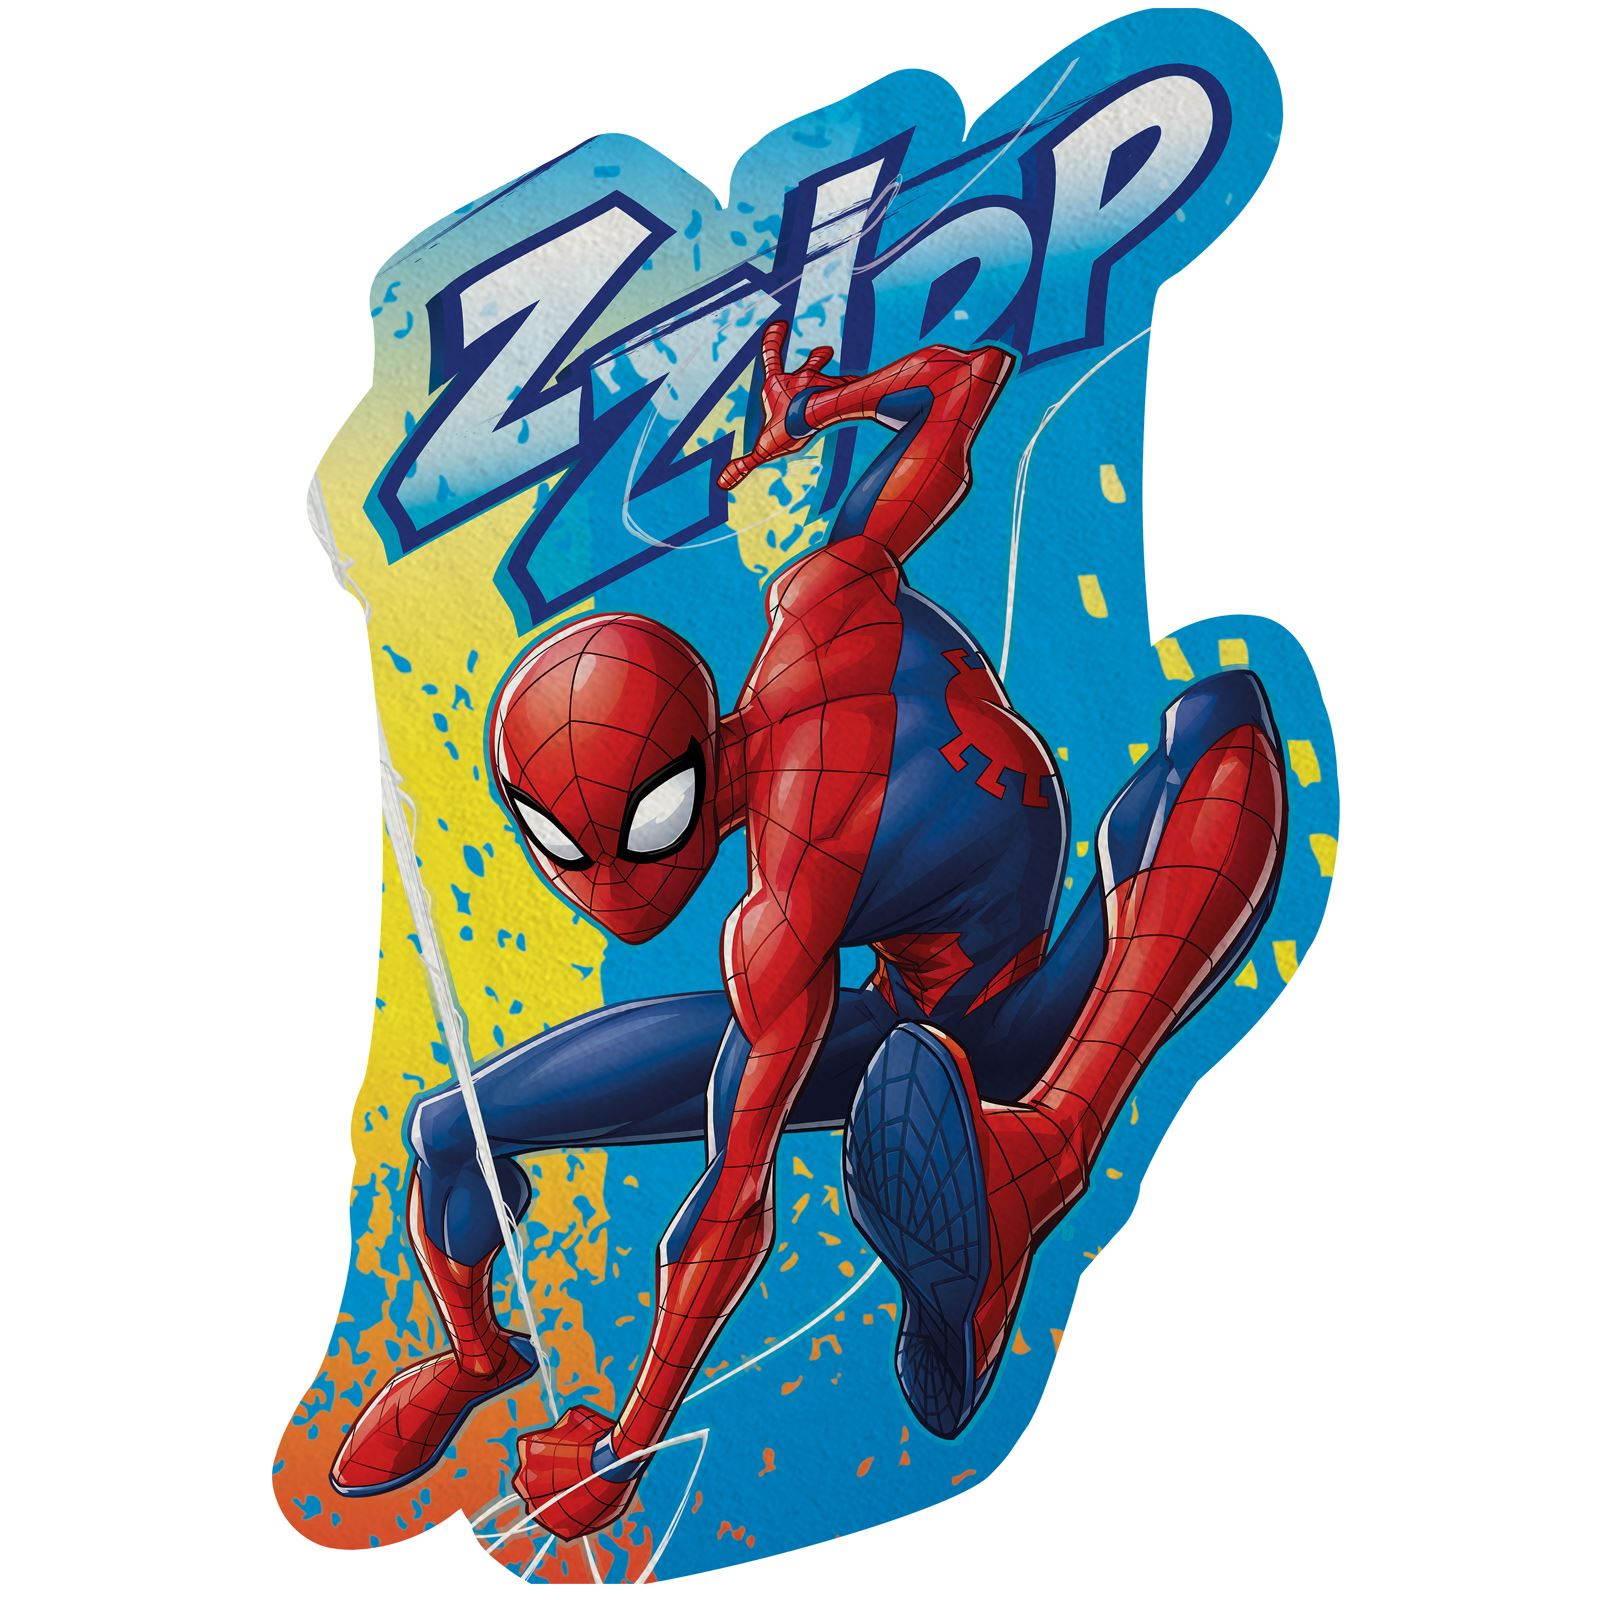 Red 80 x 120 cm Marvel Spiderman Kids Hooded Fleece Blanket